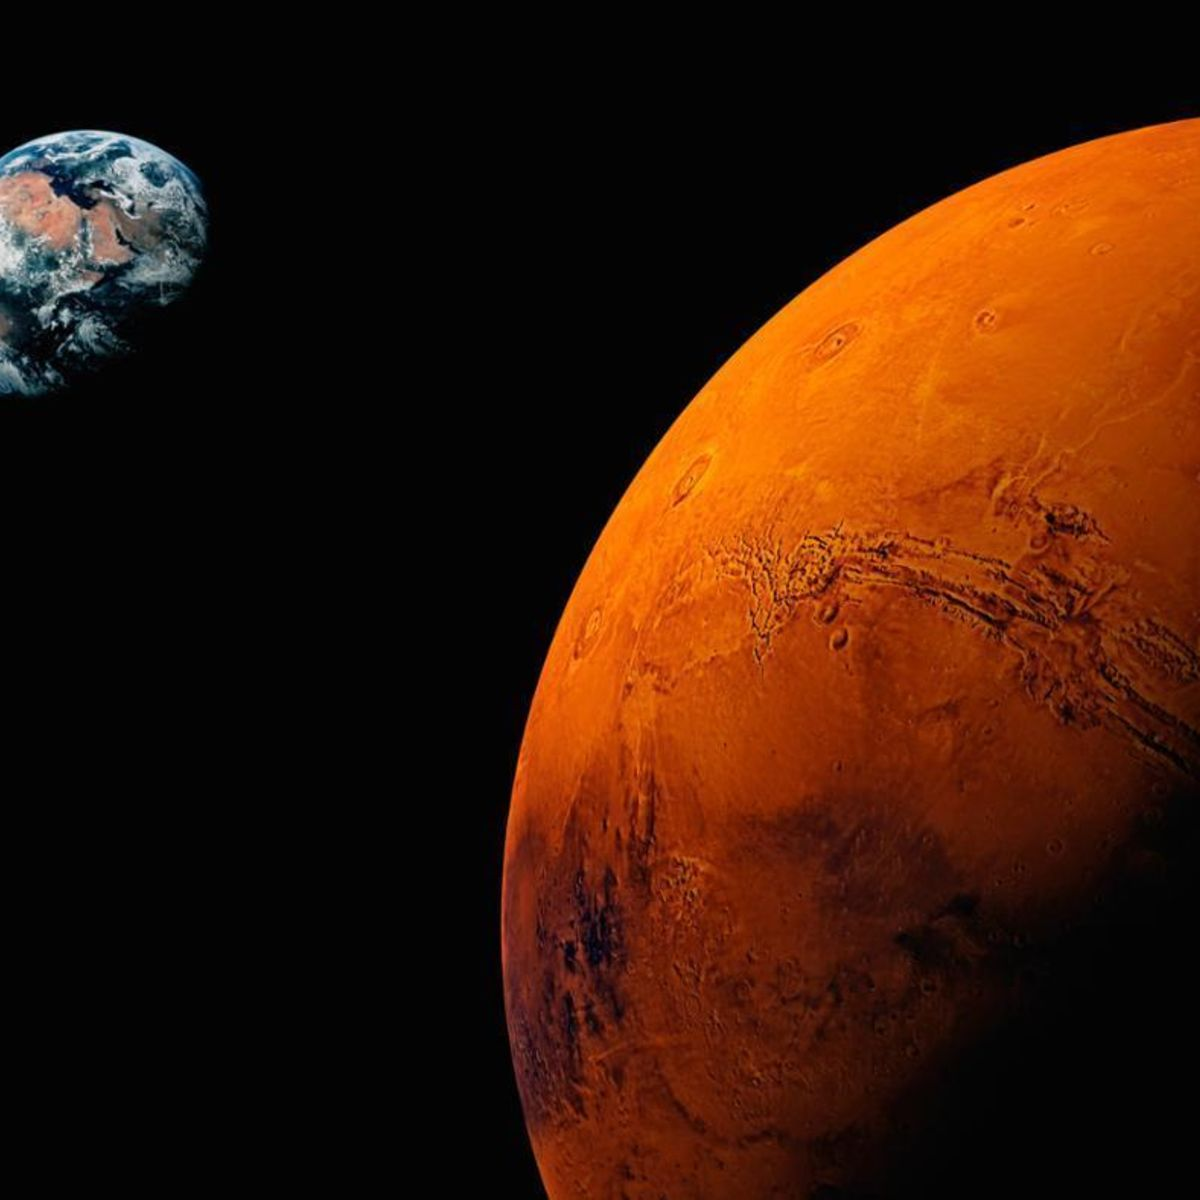 can-mars-transformed-another-earth_ec868b3f0b2253e5.jpg